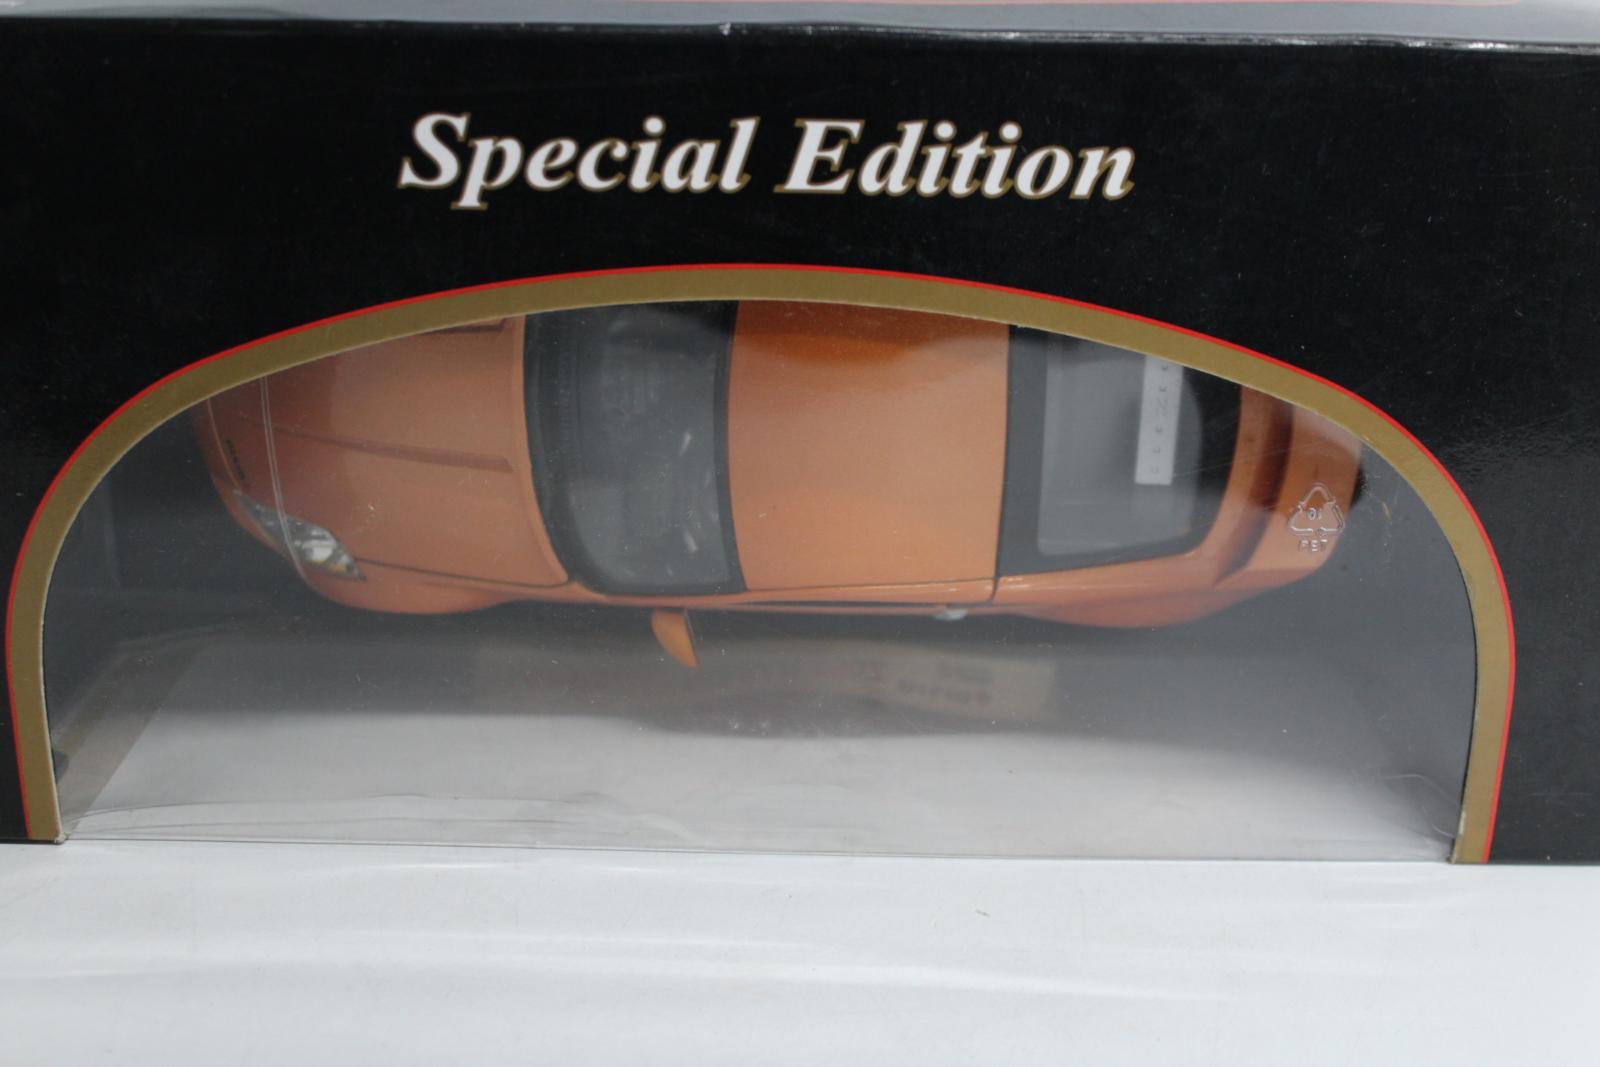 Maisto-31688-EDICIoN-Especial-Nissan-350z-Nismo-S-Tune-1-18-Escala-Modelo-de-Coche-Nuevo miniatura 8